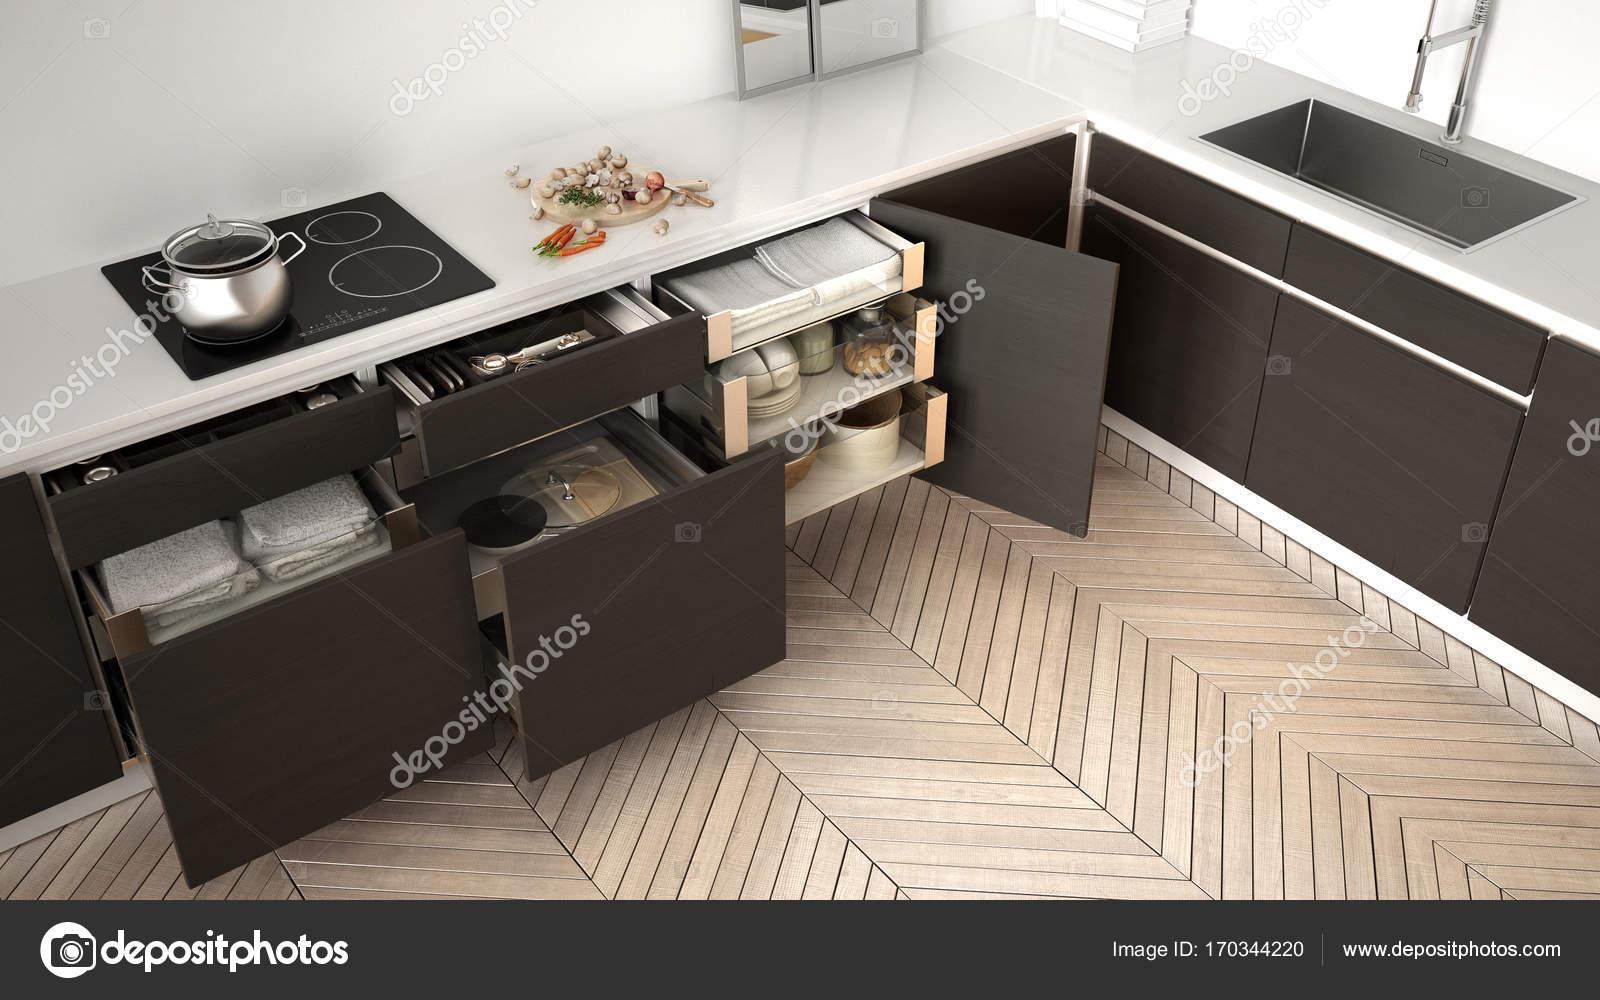 https://st3.depositphotos.com/1152281/17034/i/1600/depositphotos_170344220-stockafbeelding-moderne-keuken-bovenaanzicht-opende-houten.jpg